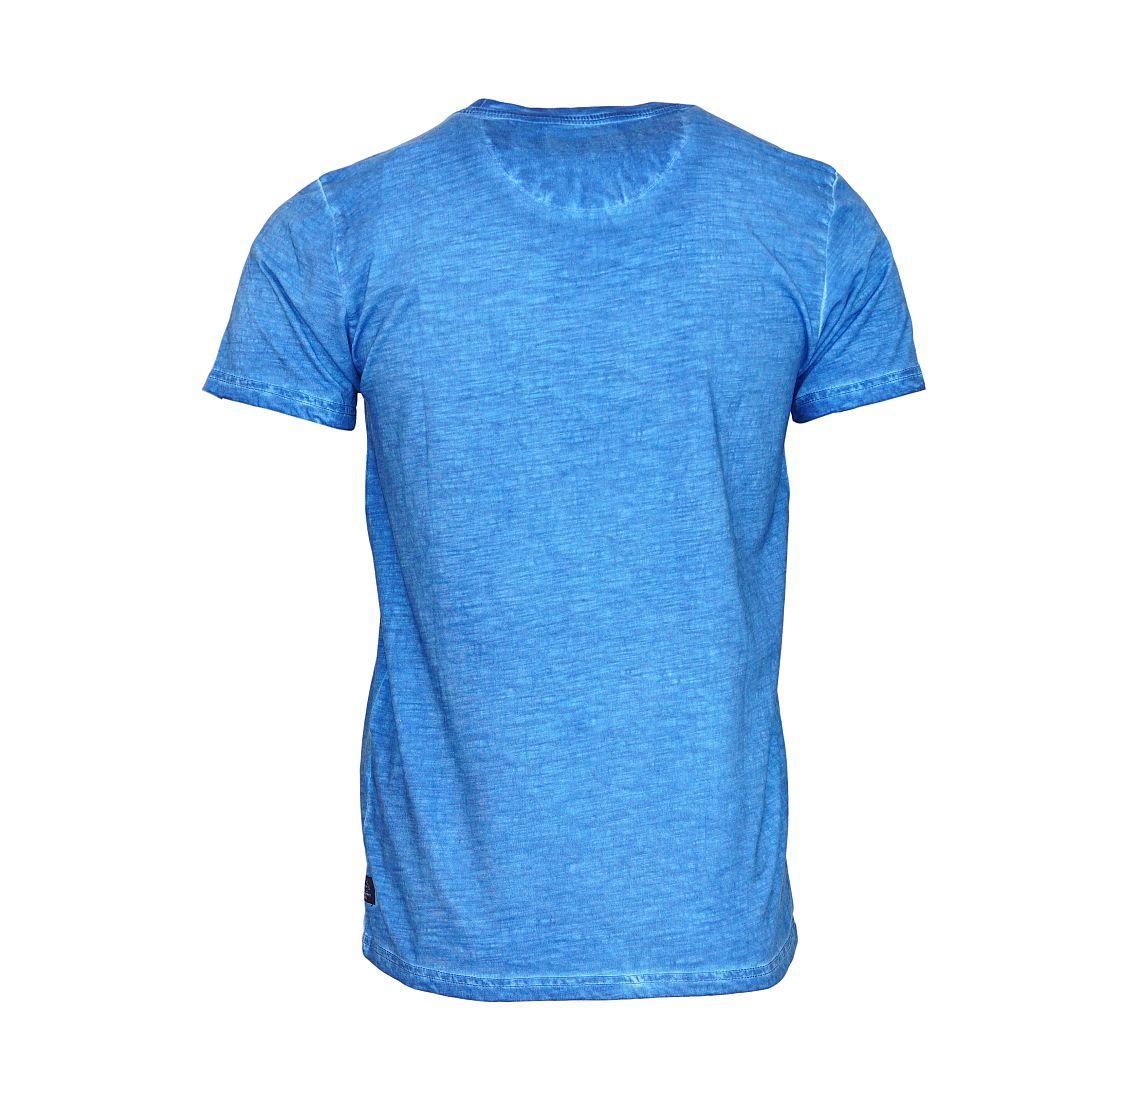 Petrol Industries T-Shirt Shirt blau M SS16 TSR604 570